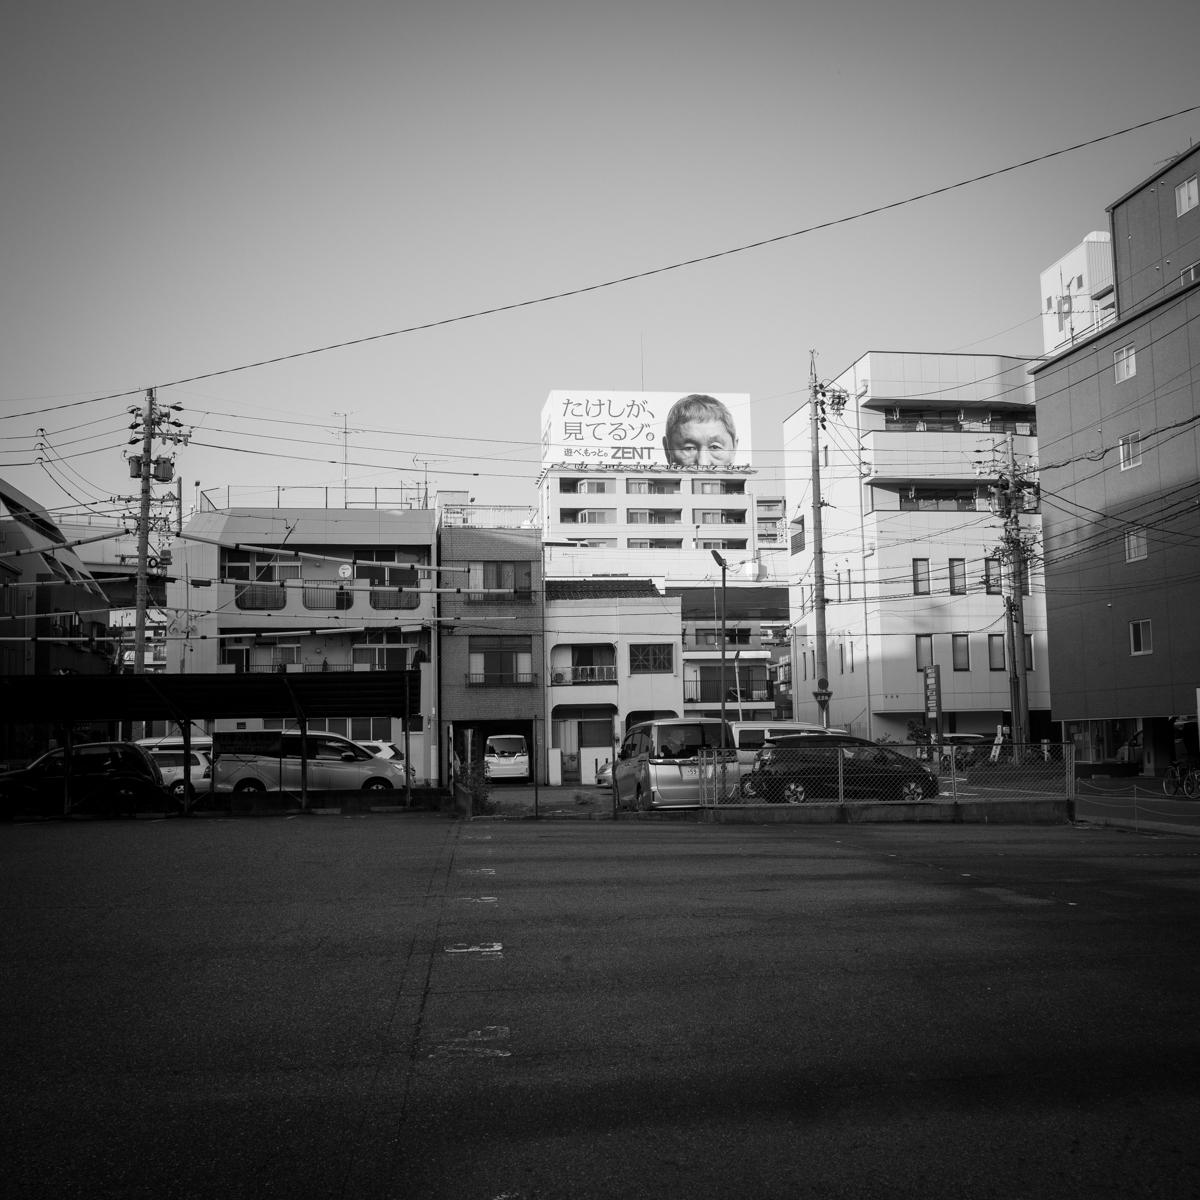 f:id:nagoya-meshi:20191204213122j:plain